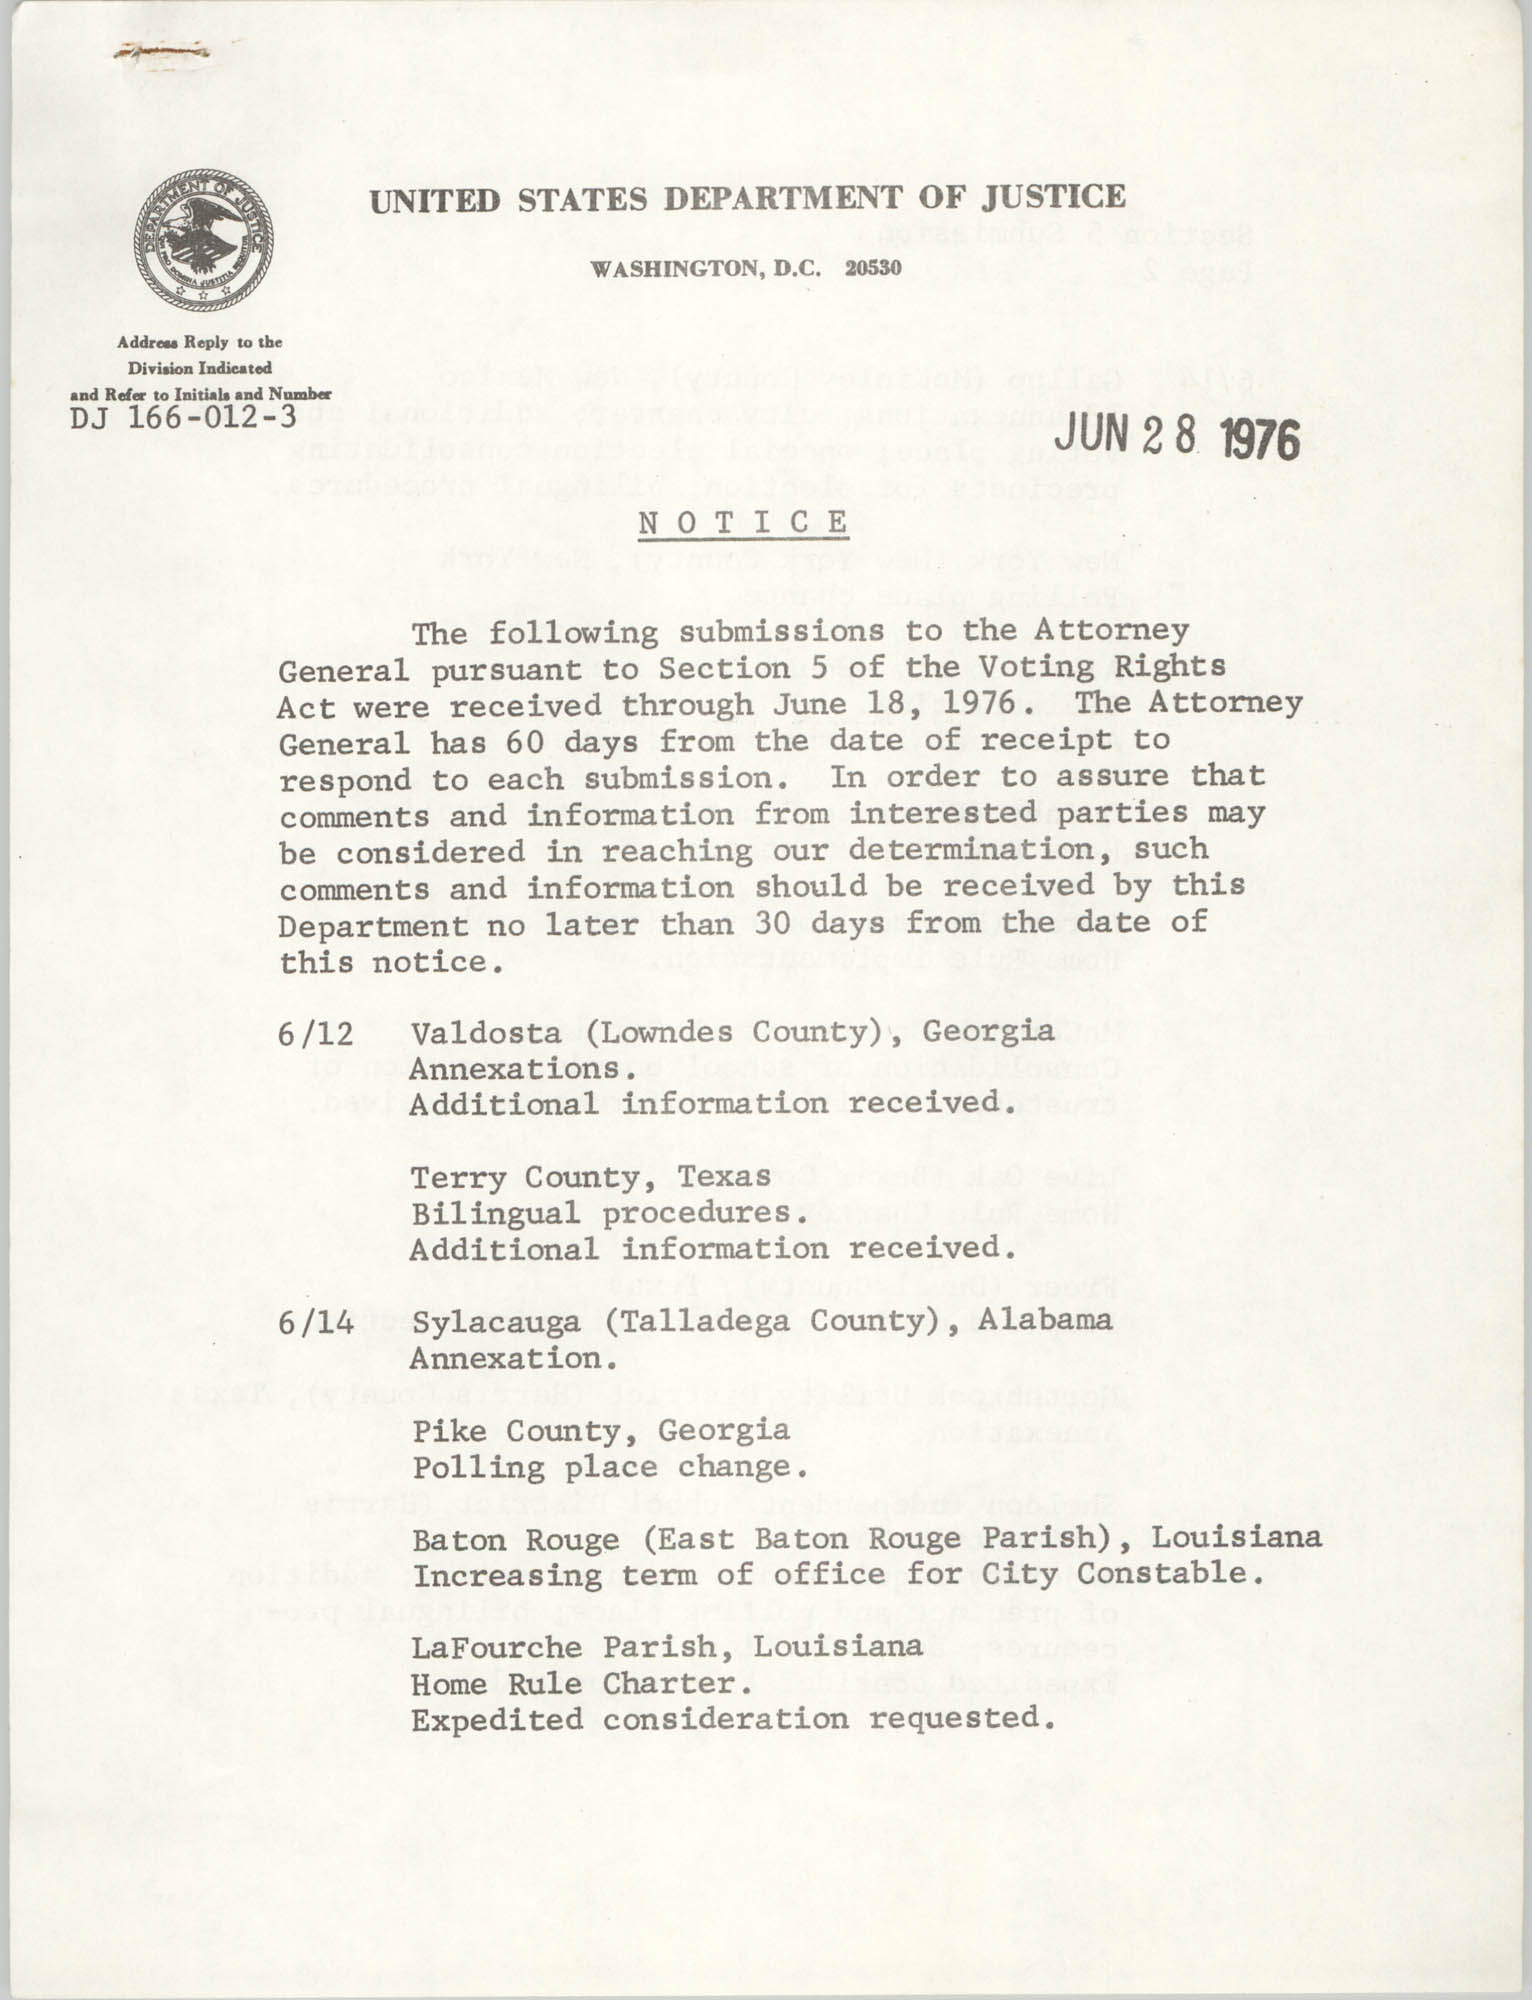 United States Department of Justice Notice, June 28, 1976